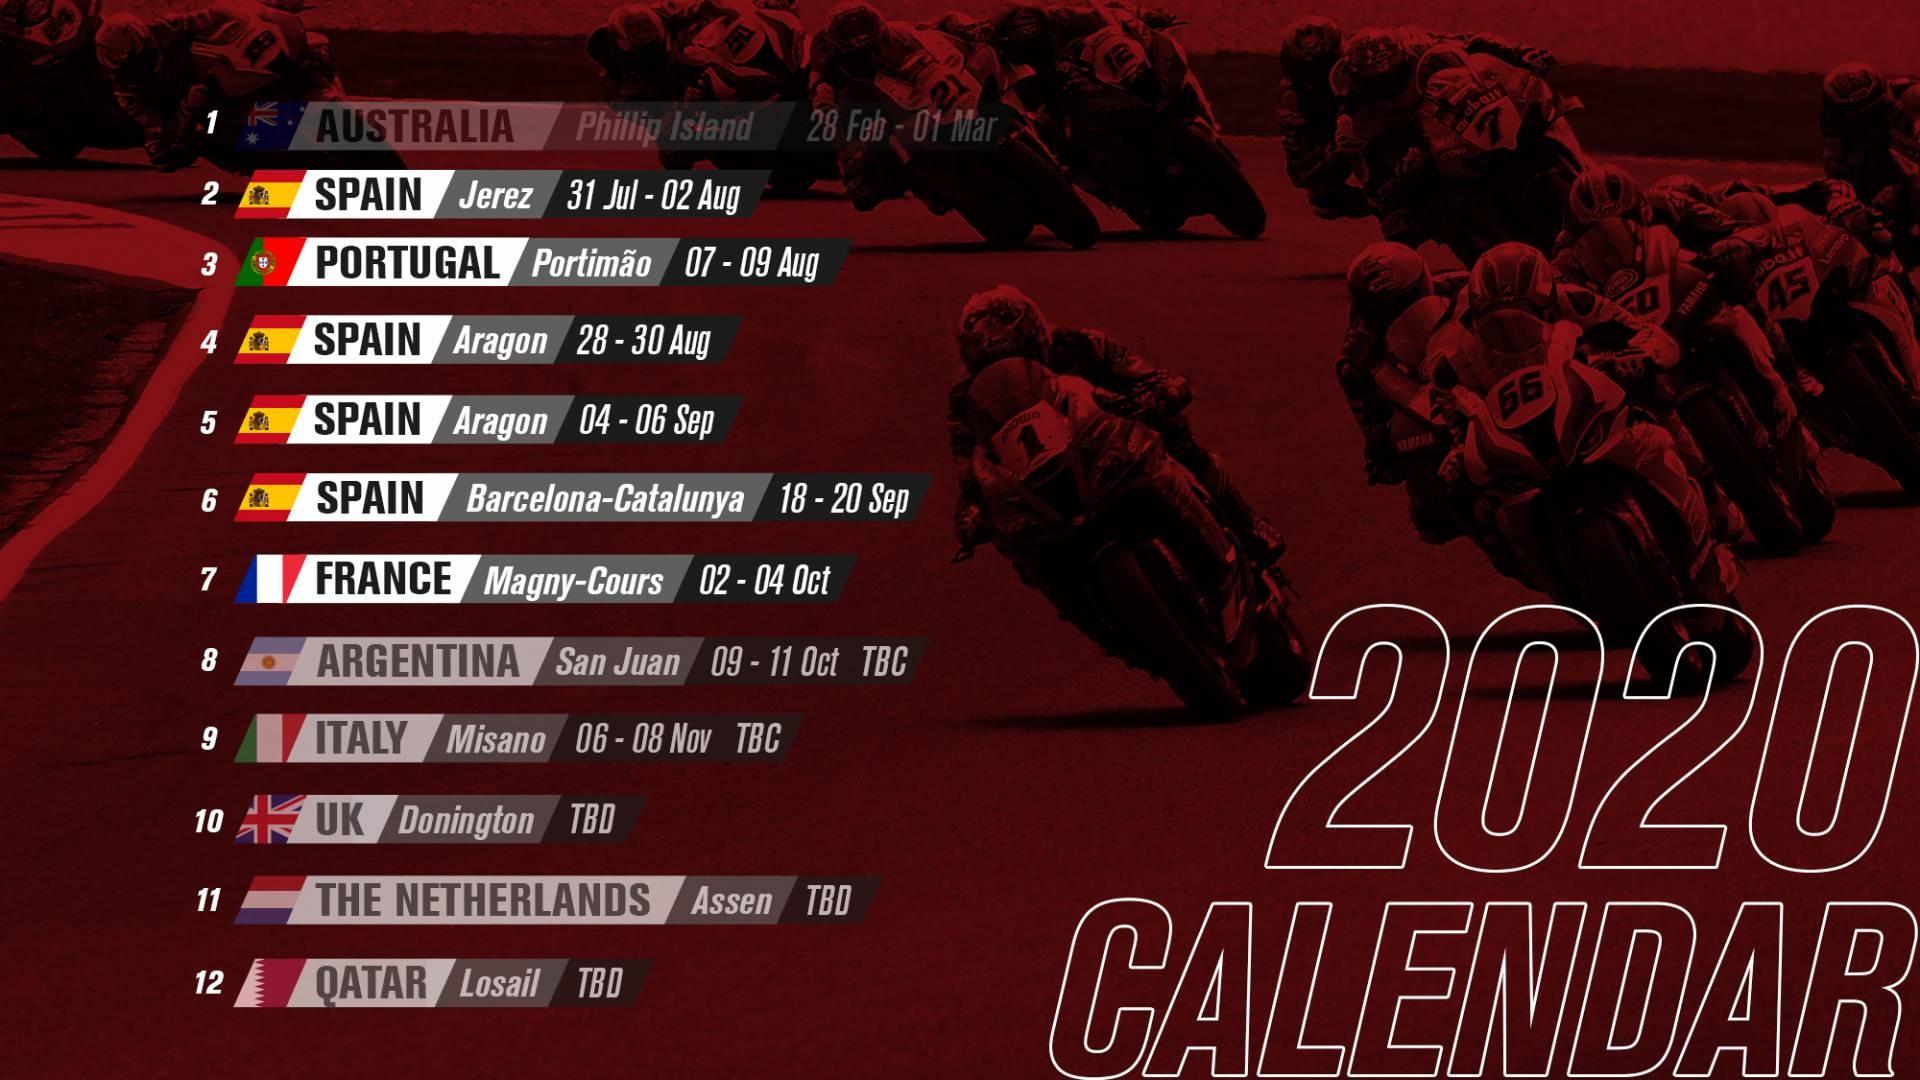 SBK 2020 Calendar top